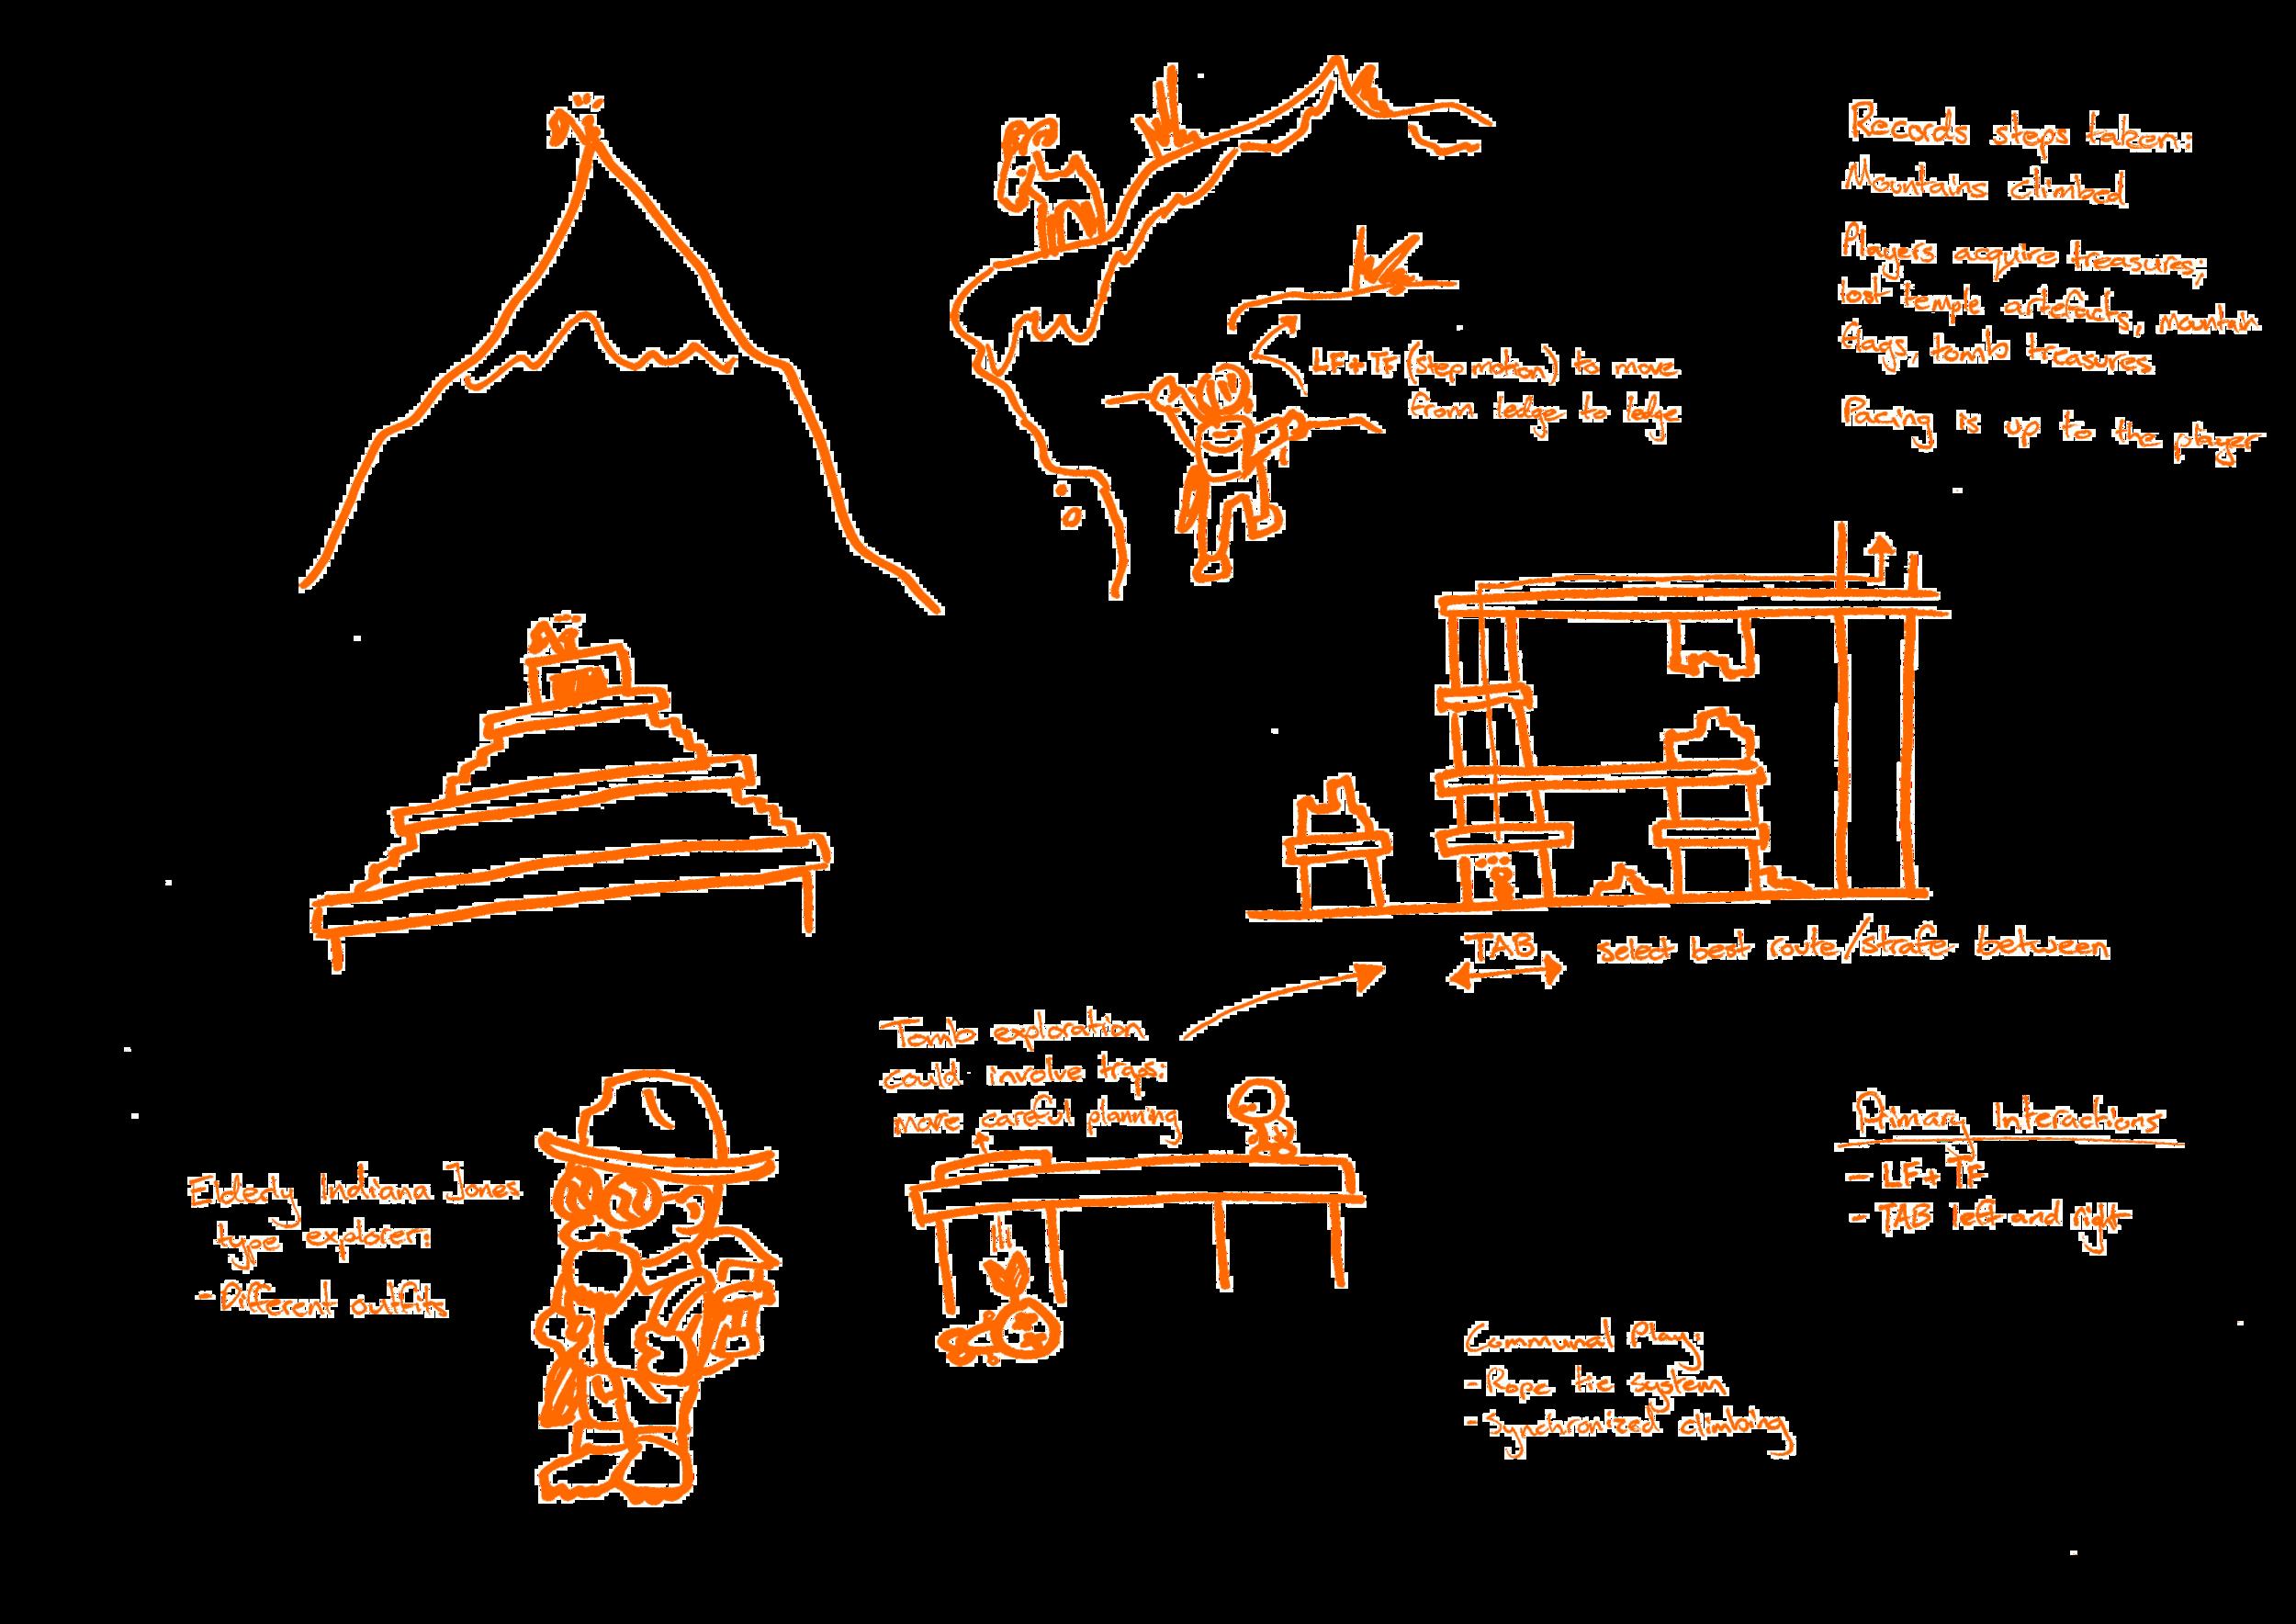 Figure 5.6 - Mountain Climbing